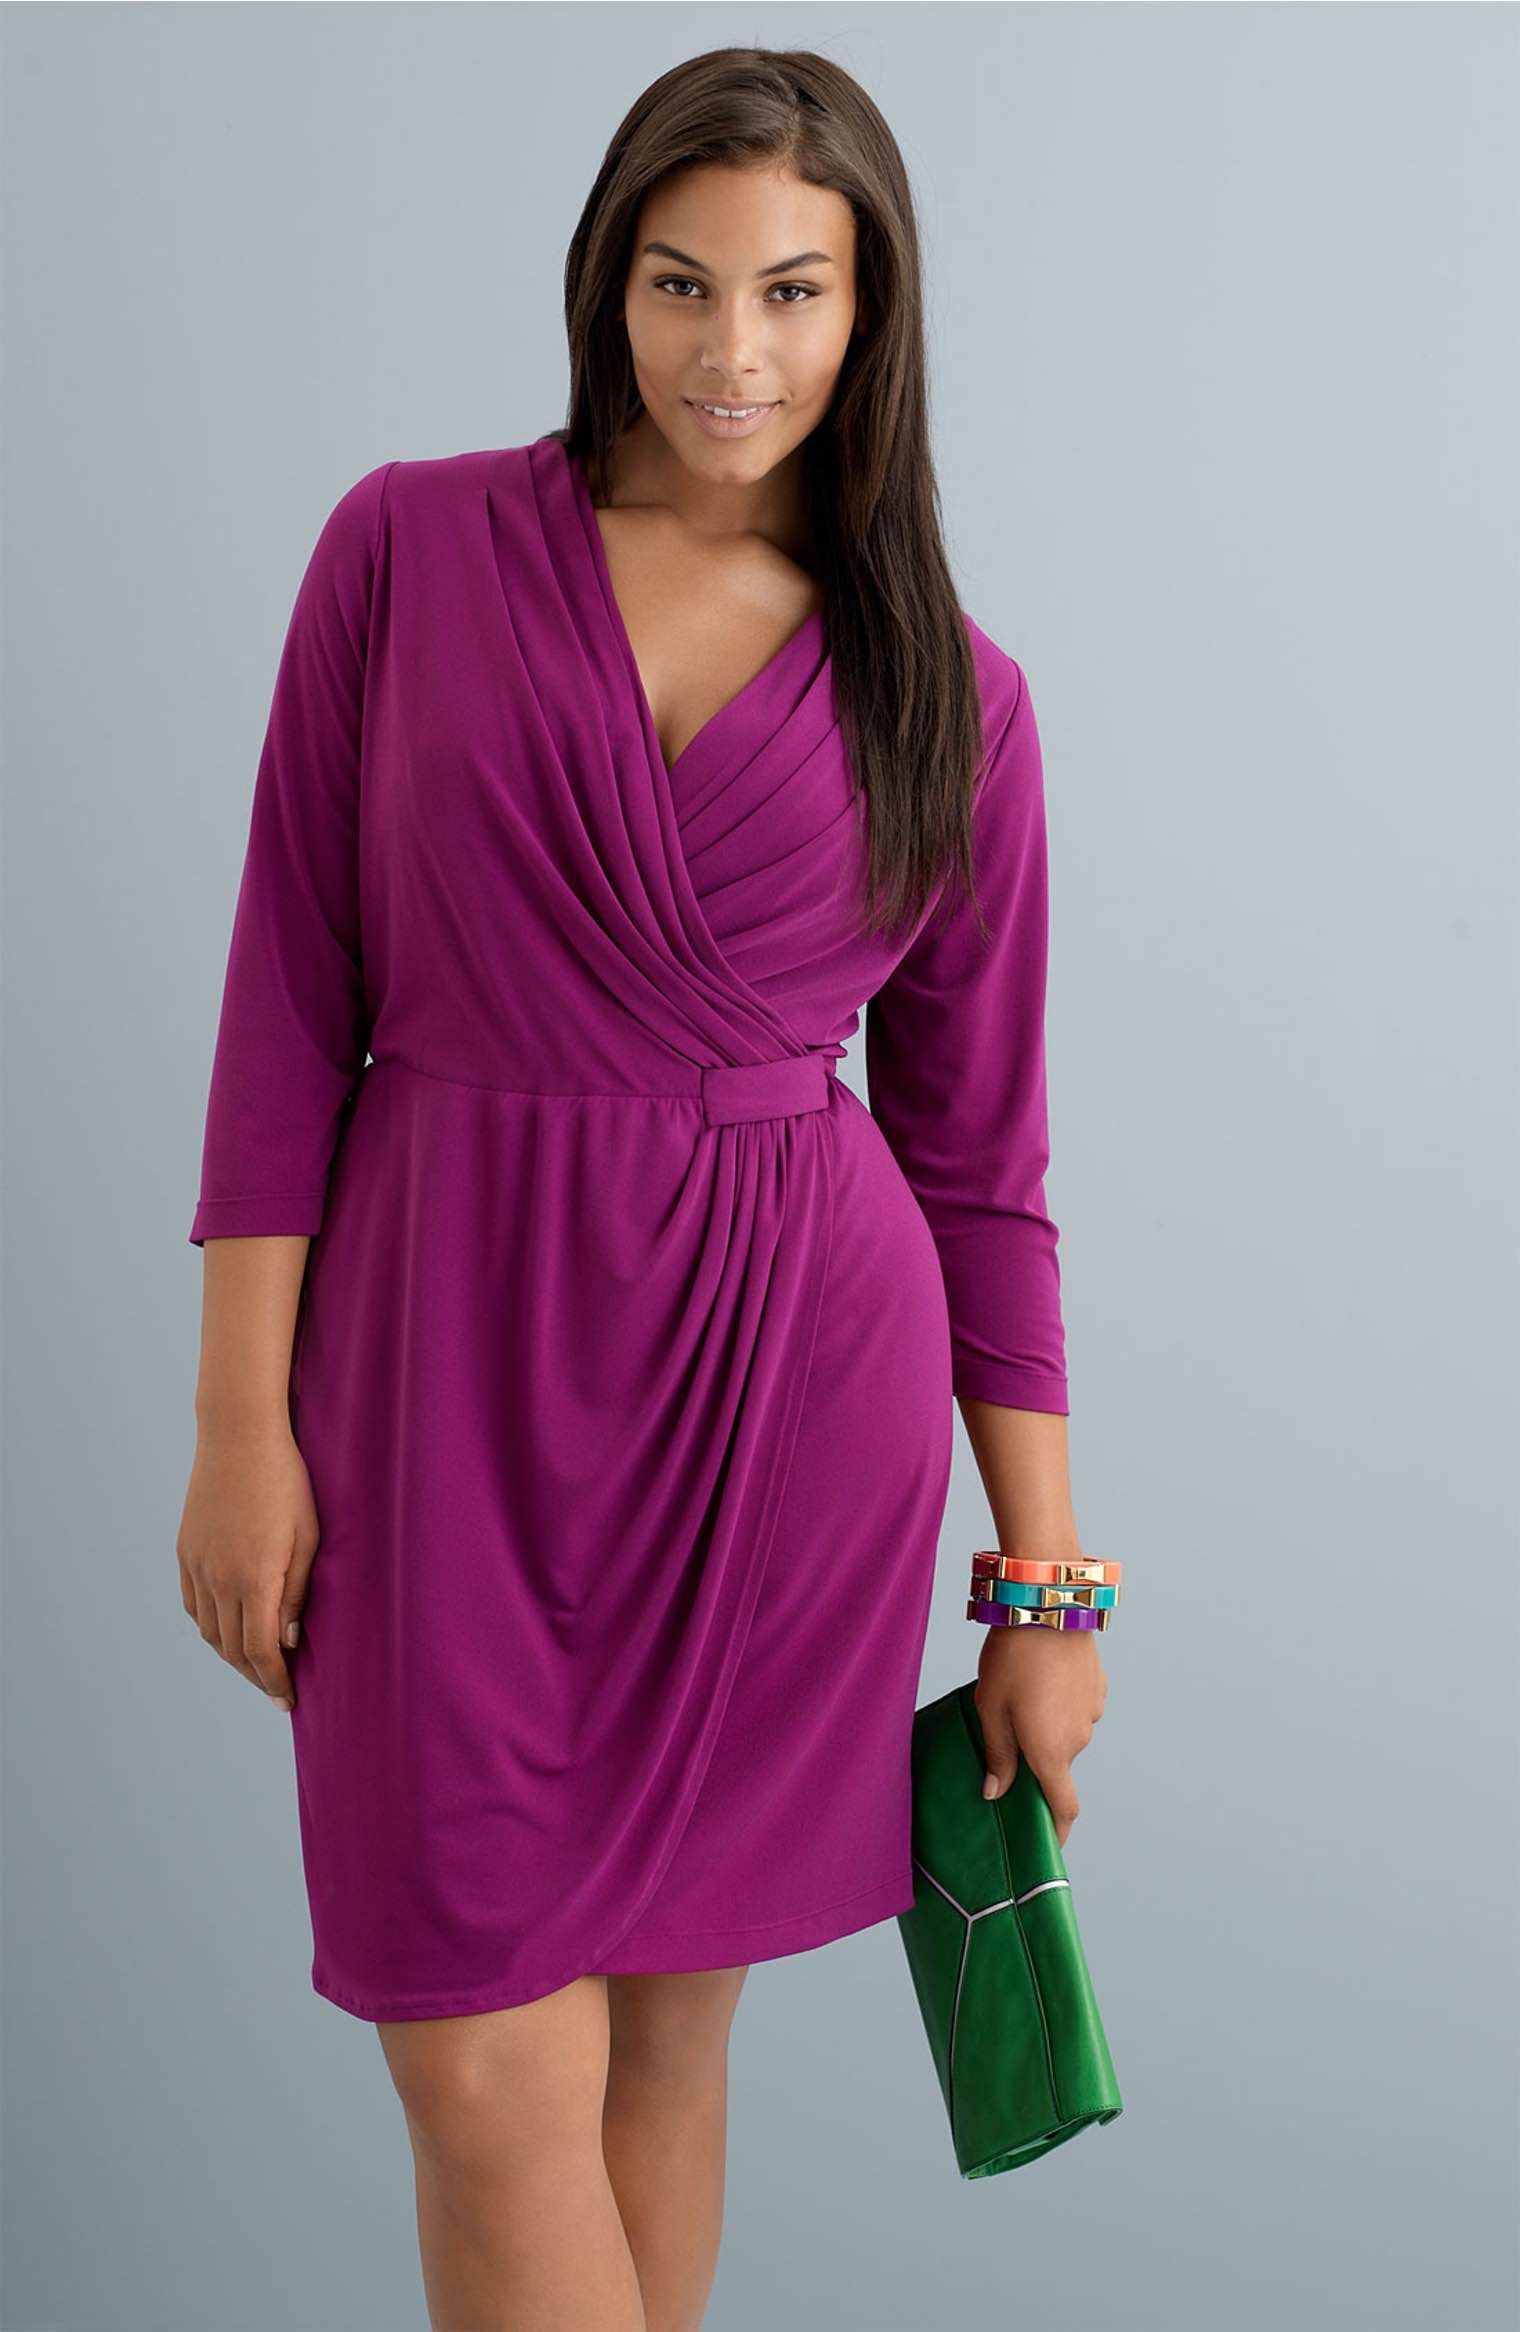 Vistoso Vestidos De Dama Donna Morgan Modelo - Vestido de Novia Para ...